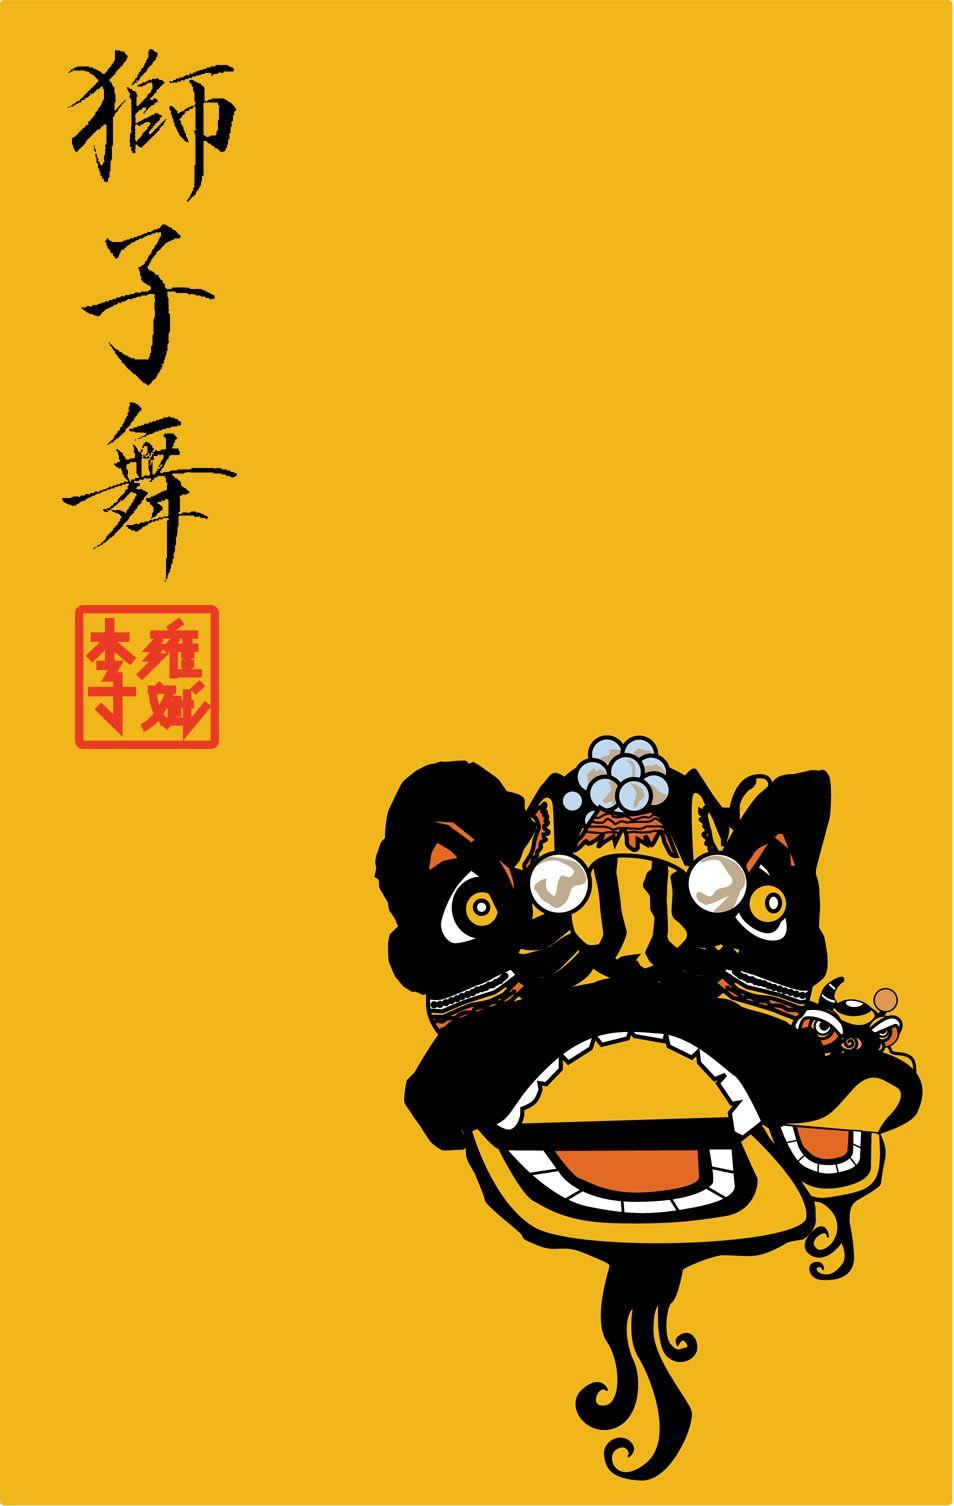 lion dance illustration Lion dance, Lion logo, Illustration